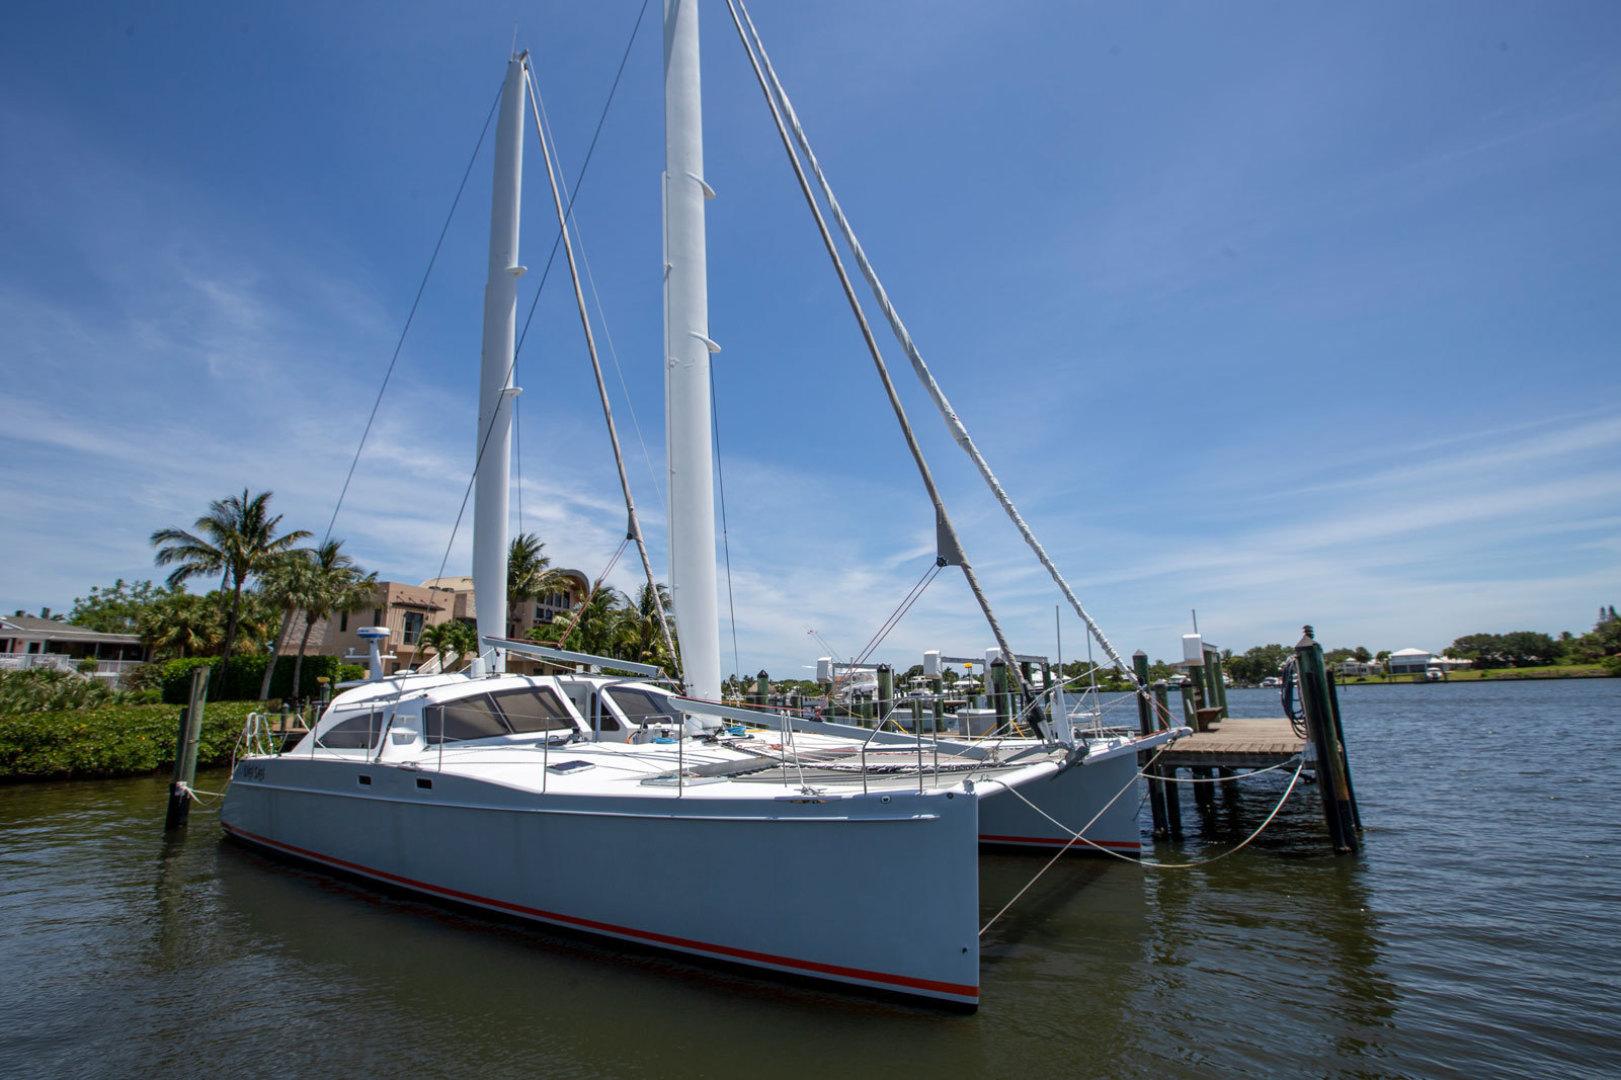 Atlantic-49 Catamaran 2018-Wabi Sabi Stuart-Florida-United States-1399307 | Thumbnail